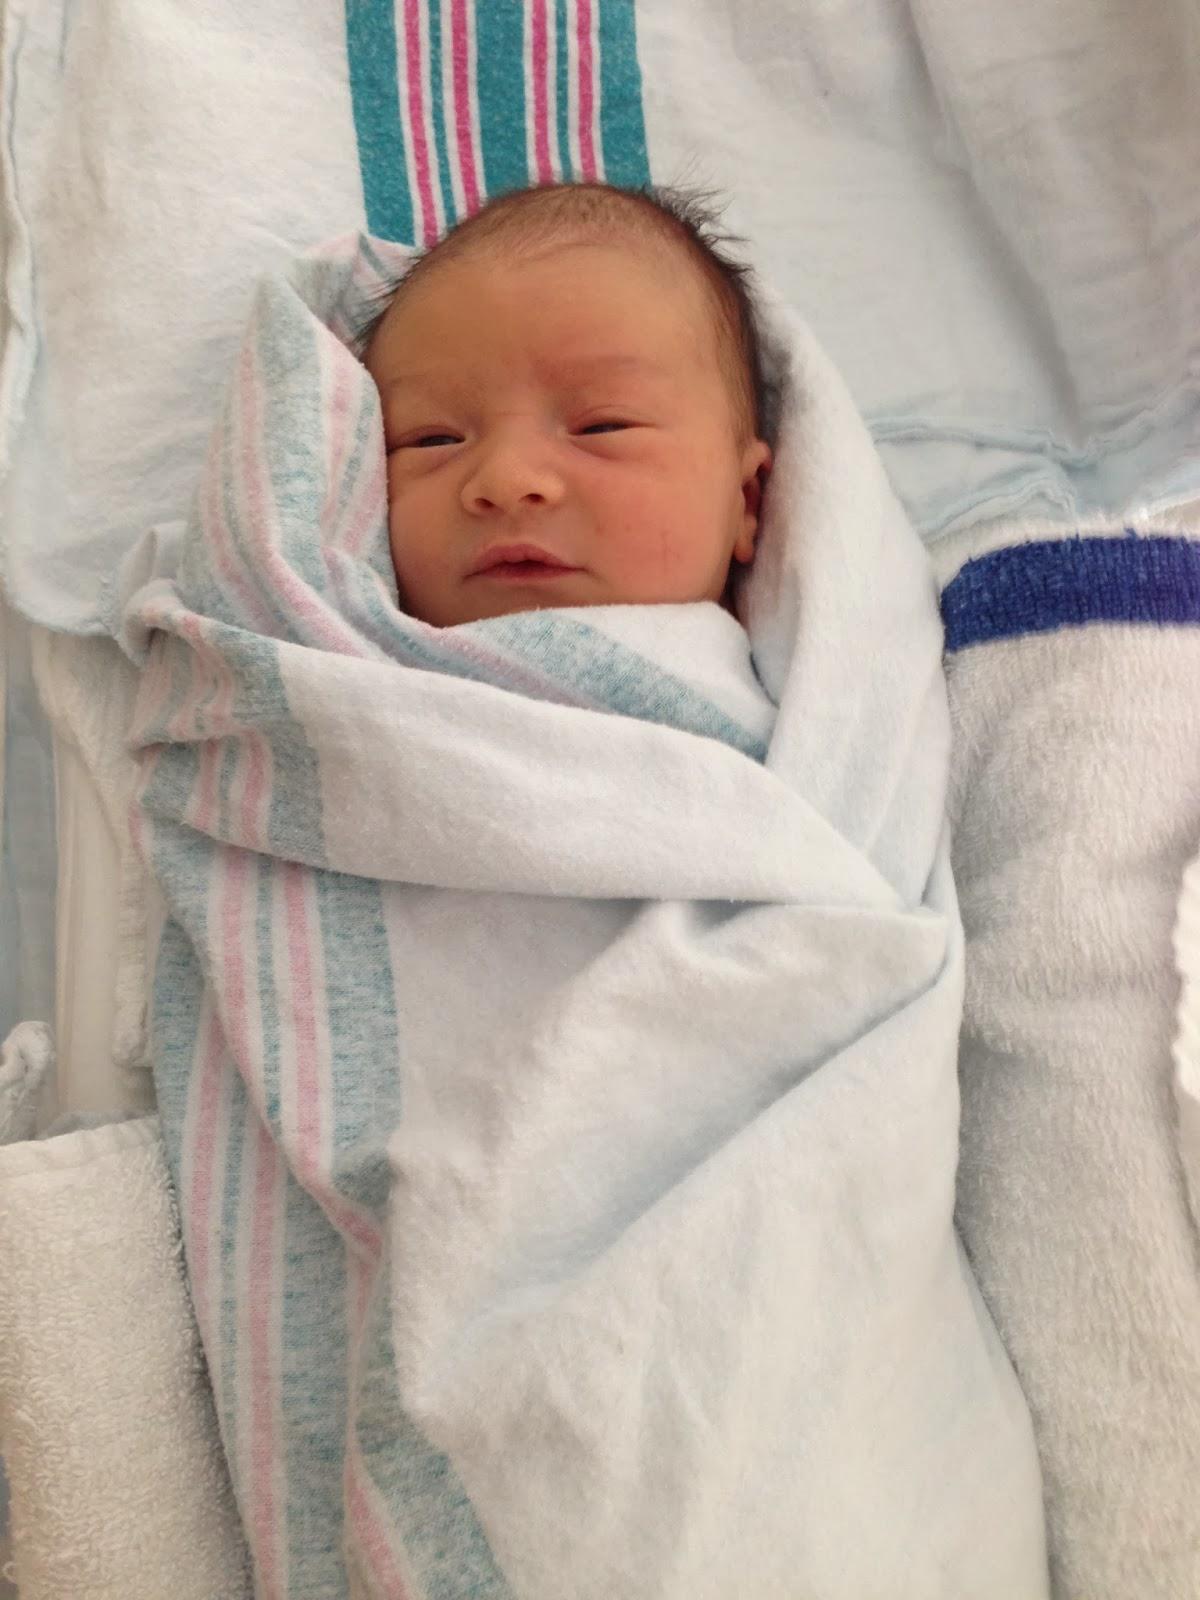 Gallery Beautiful Newborn Baby Girl In Hospital